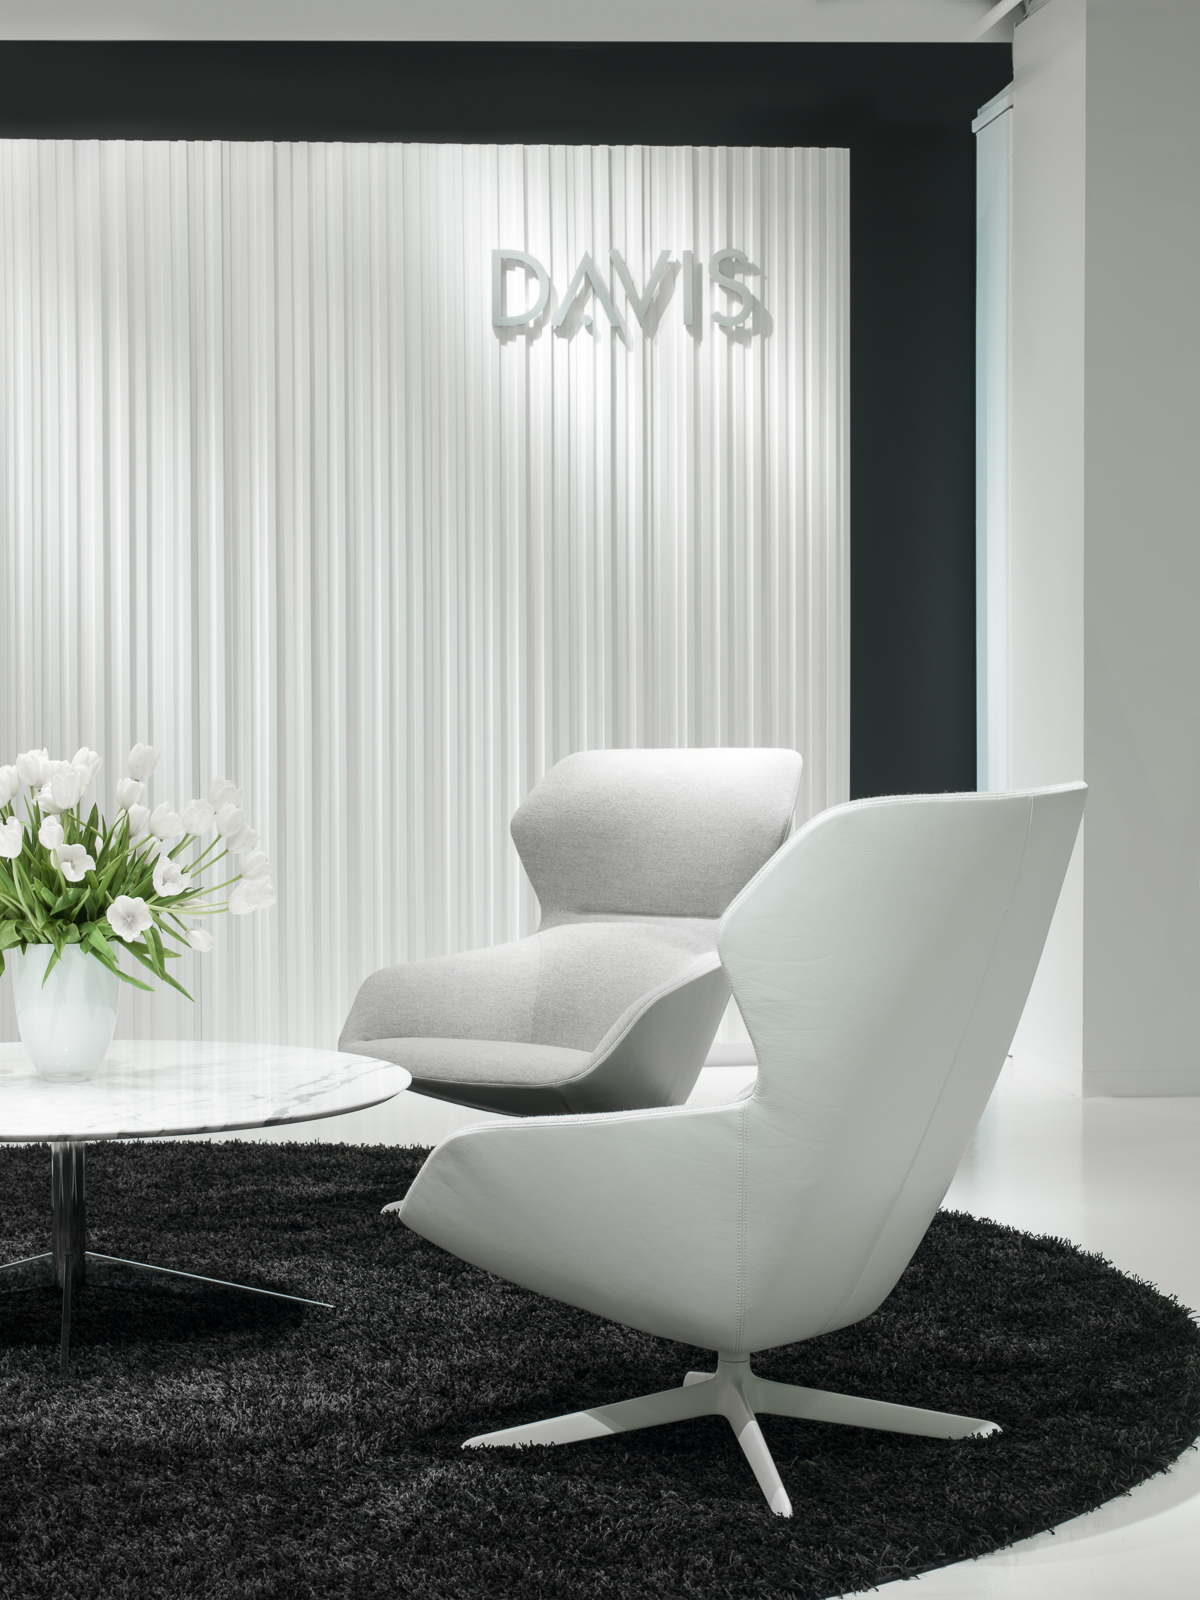 davis_furniture-1.jpg